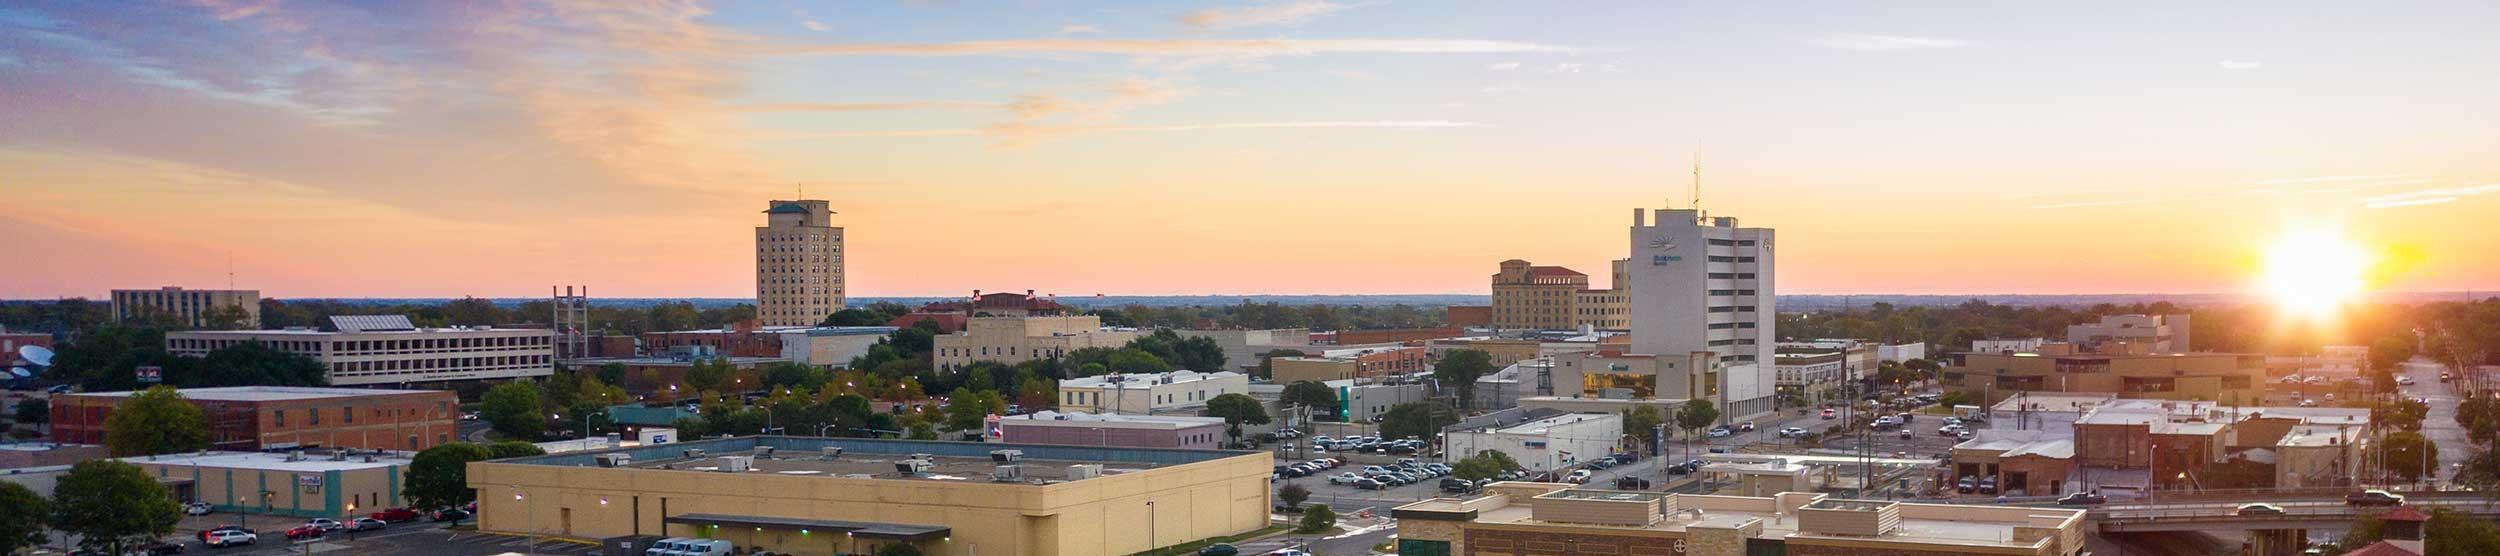 Killeen, TX